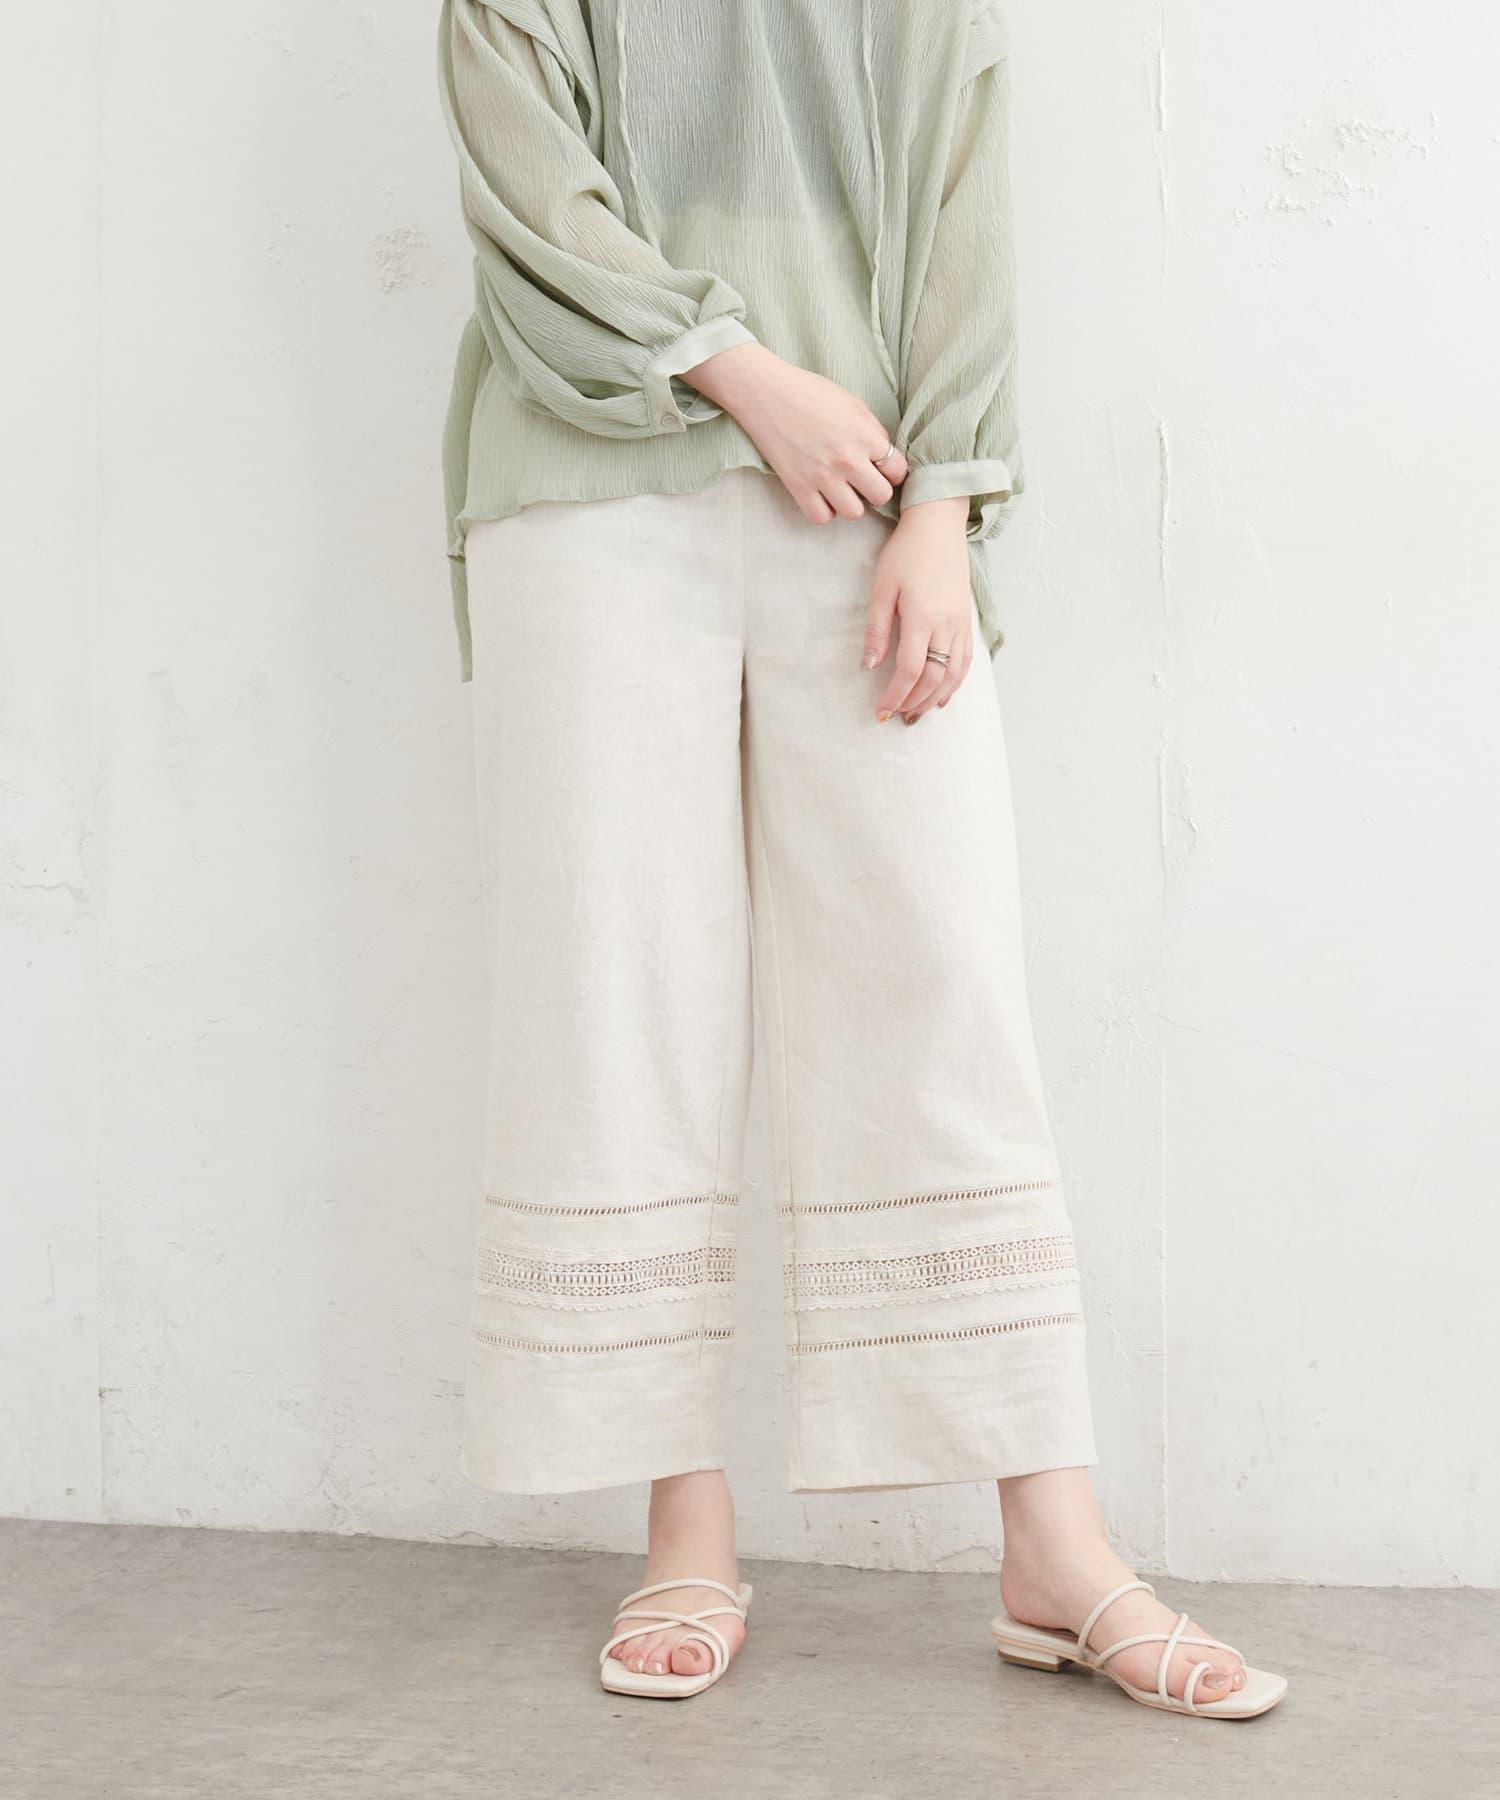 natural couture(ナチュラルクチュール) レース切替え綿麻ワイドパンツ